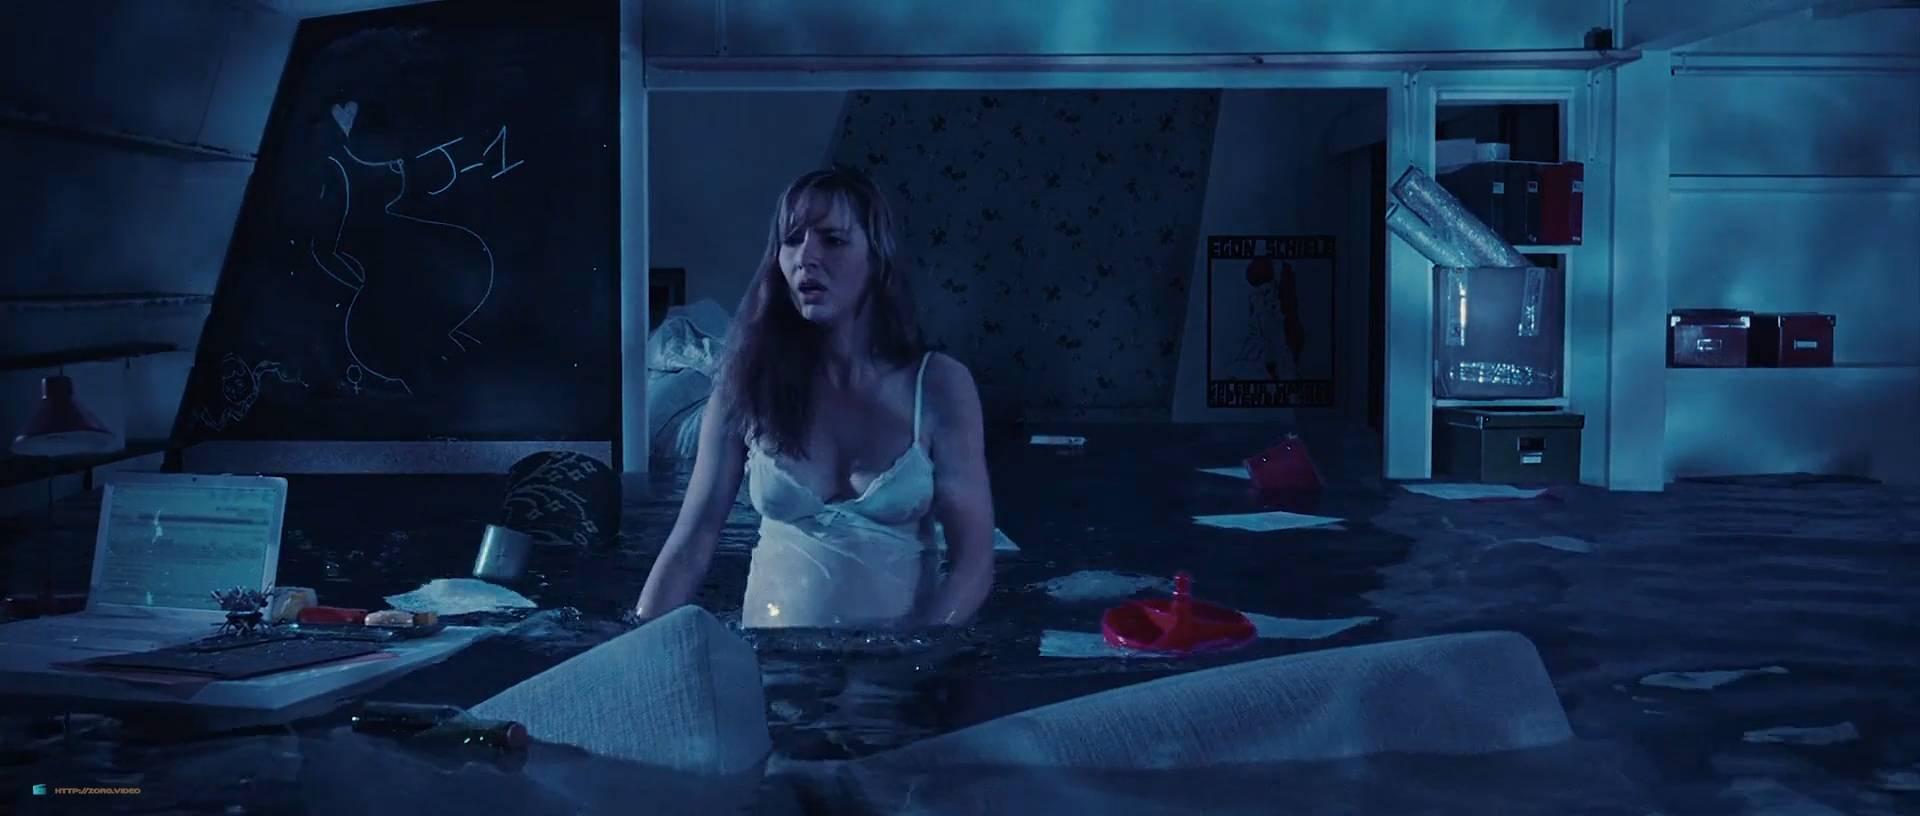 Louise Bourgoin nude and pregnant in - Unheureux événement (FR-2011) HD 1080p (8)